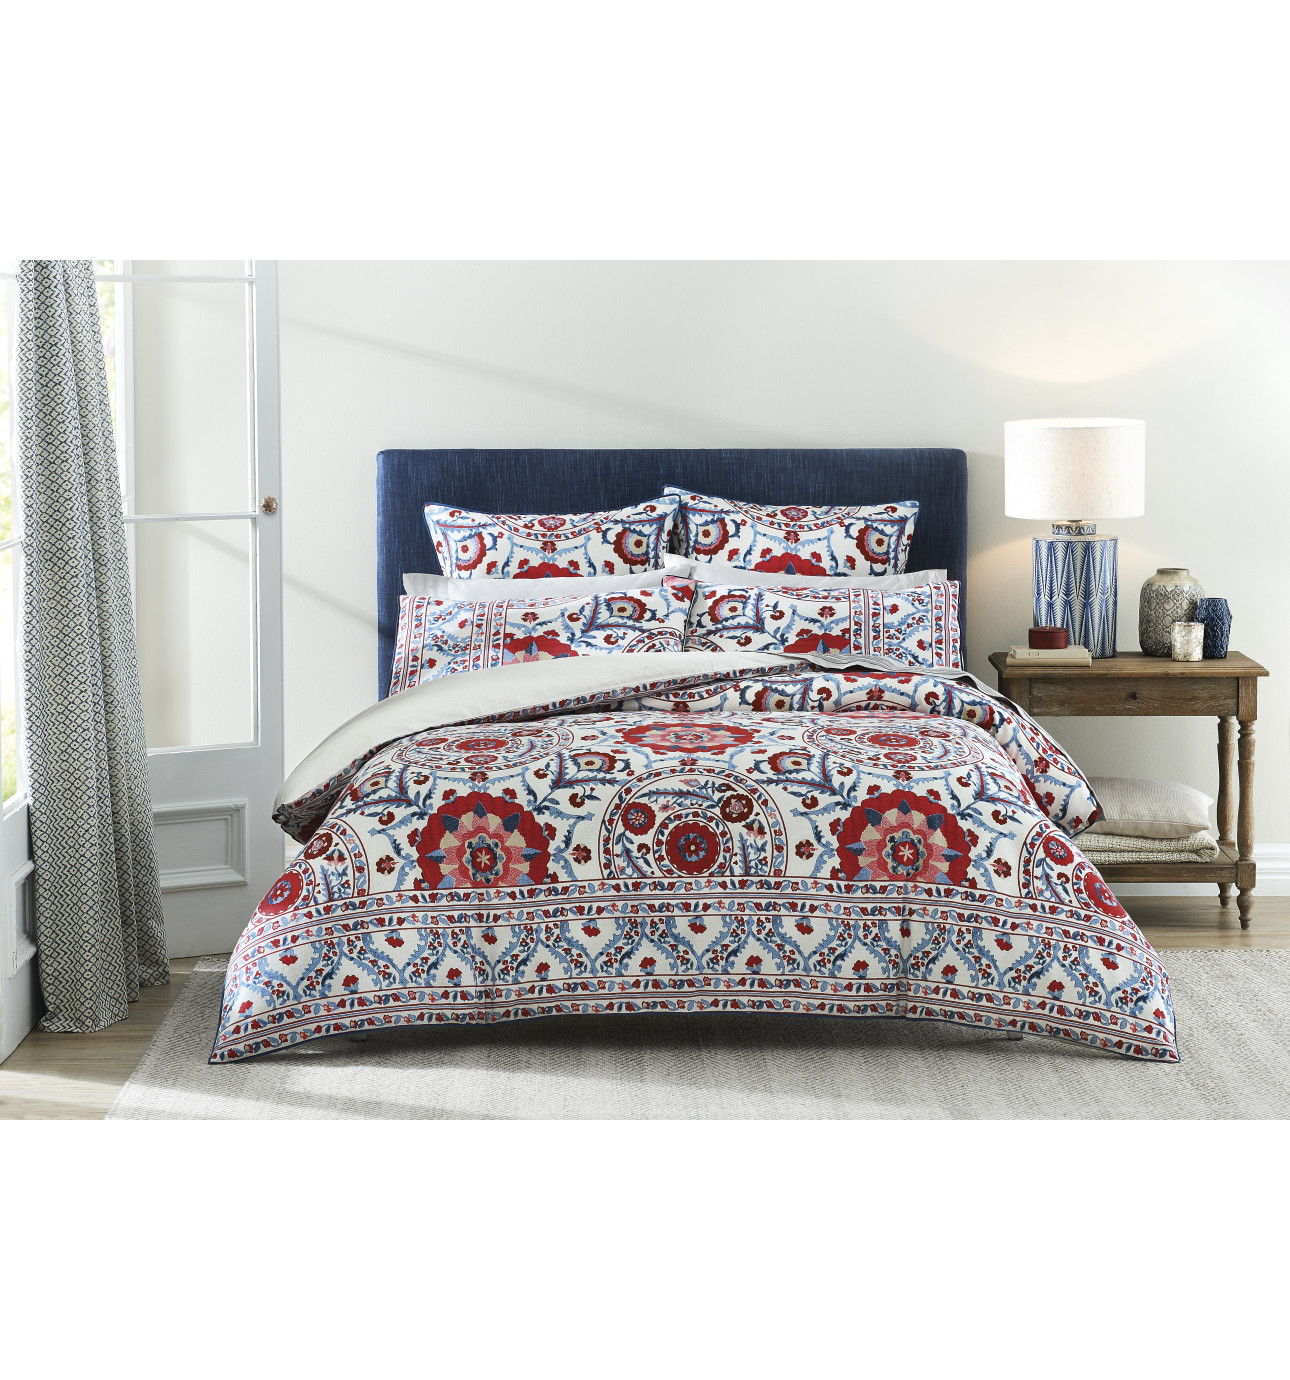 Anthos Double Bed Quilt Cover   David Jones : sanderson quilts - Adamdwight.com